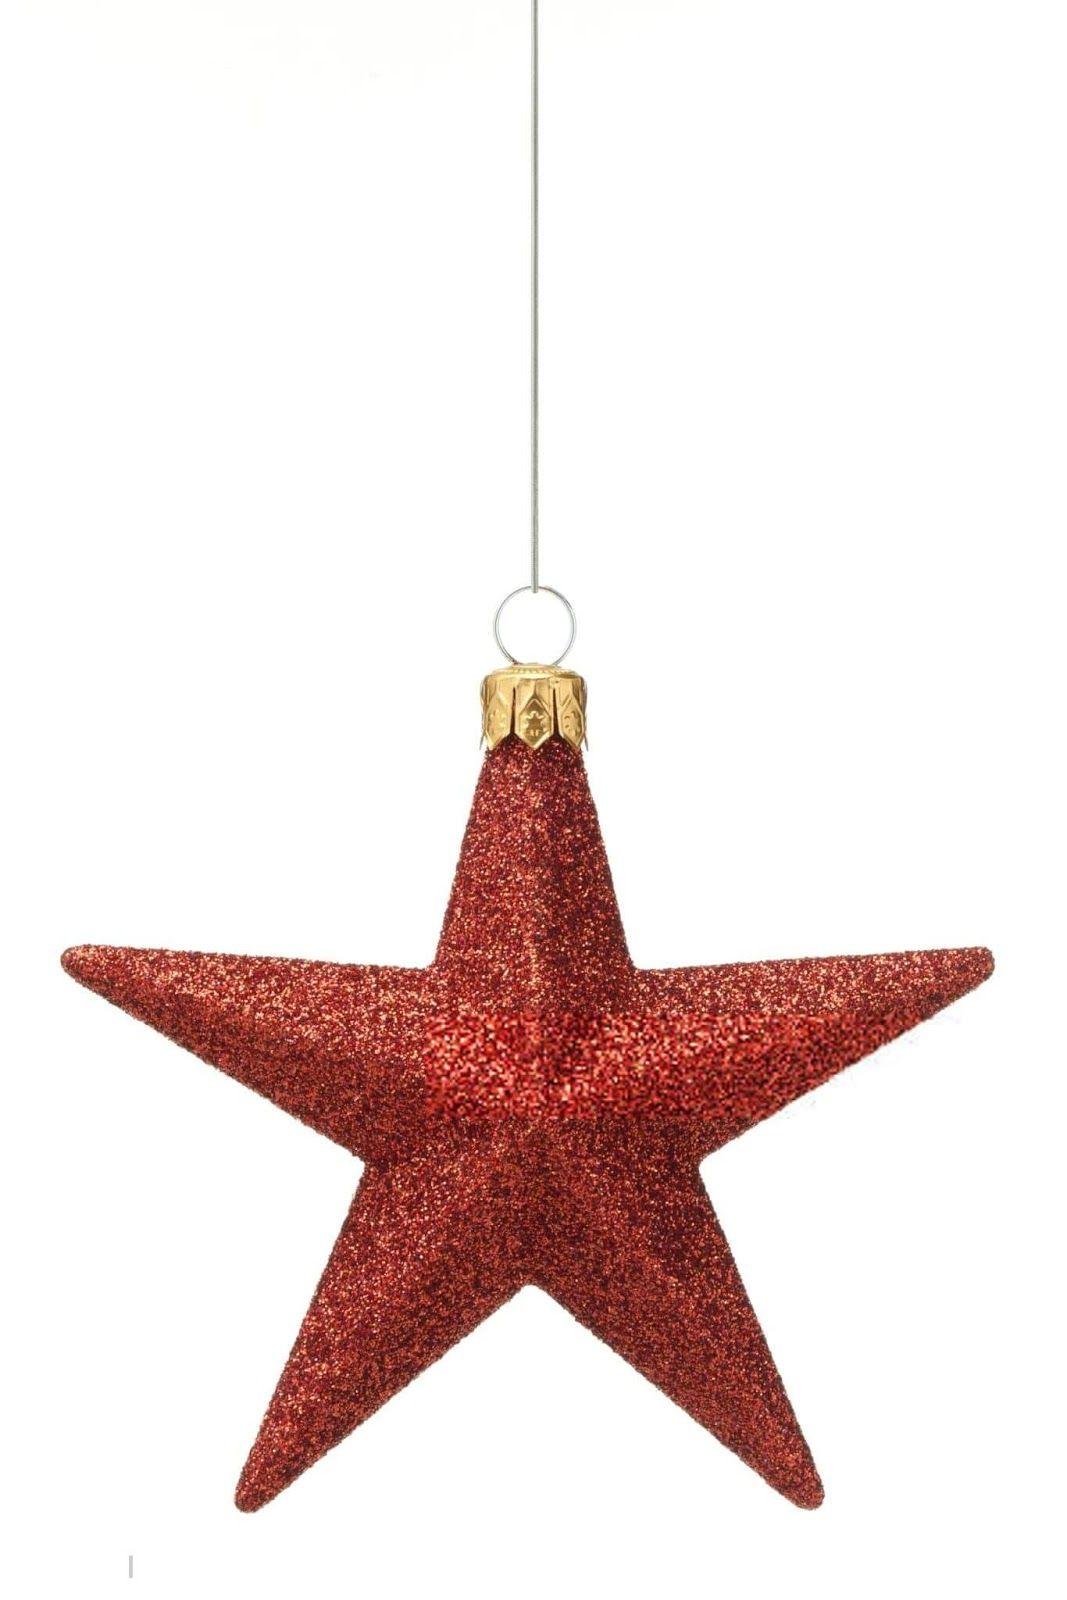 Home interior nativity set 5599 christmas stars images clip art pictures u photos  christmas